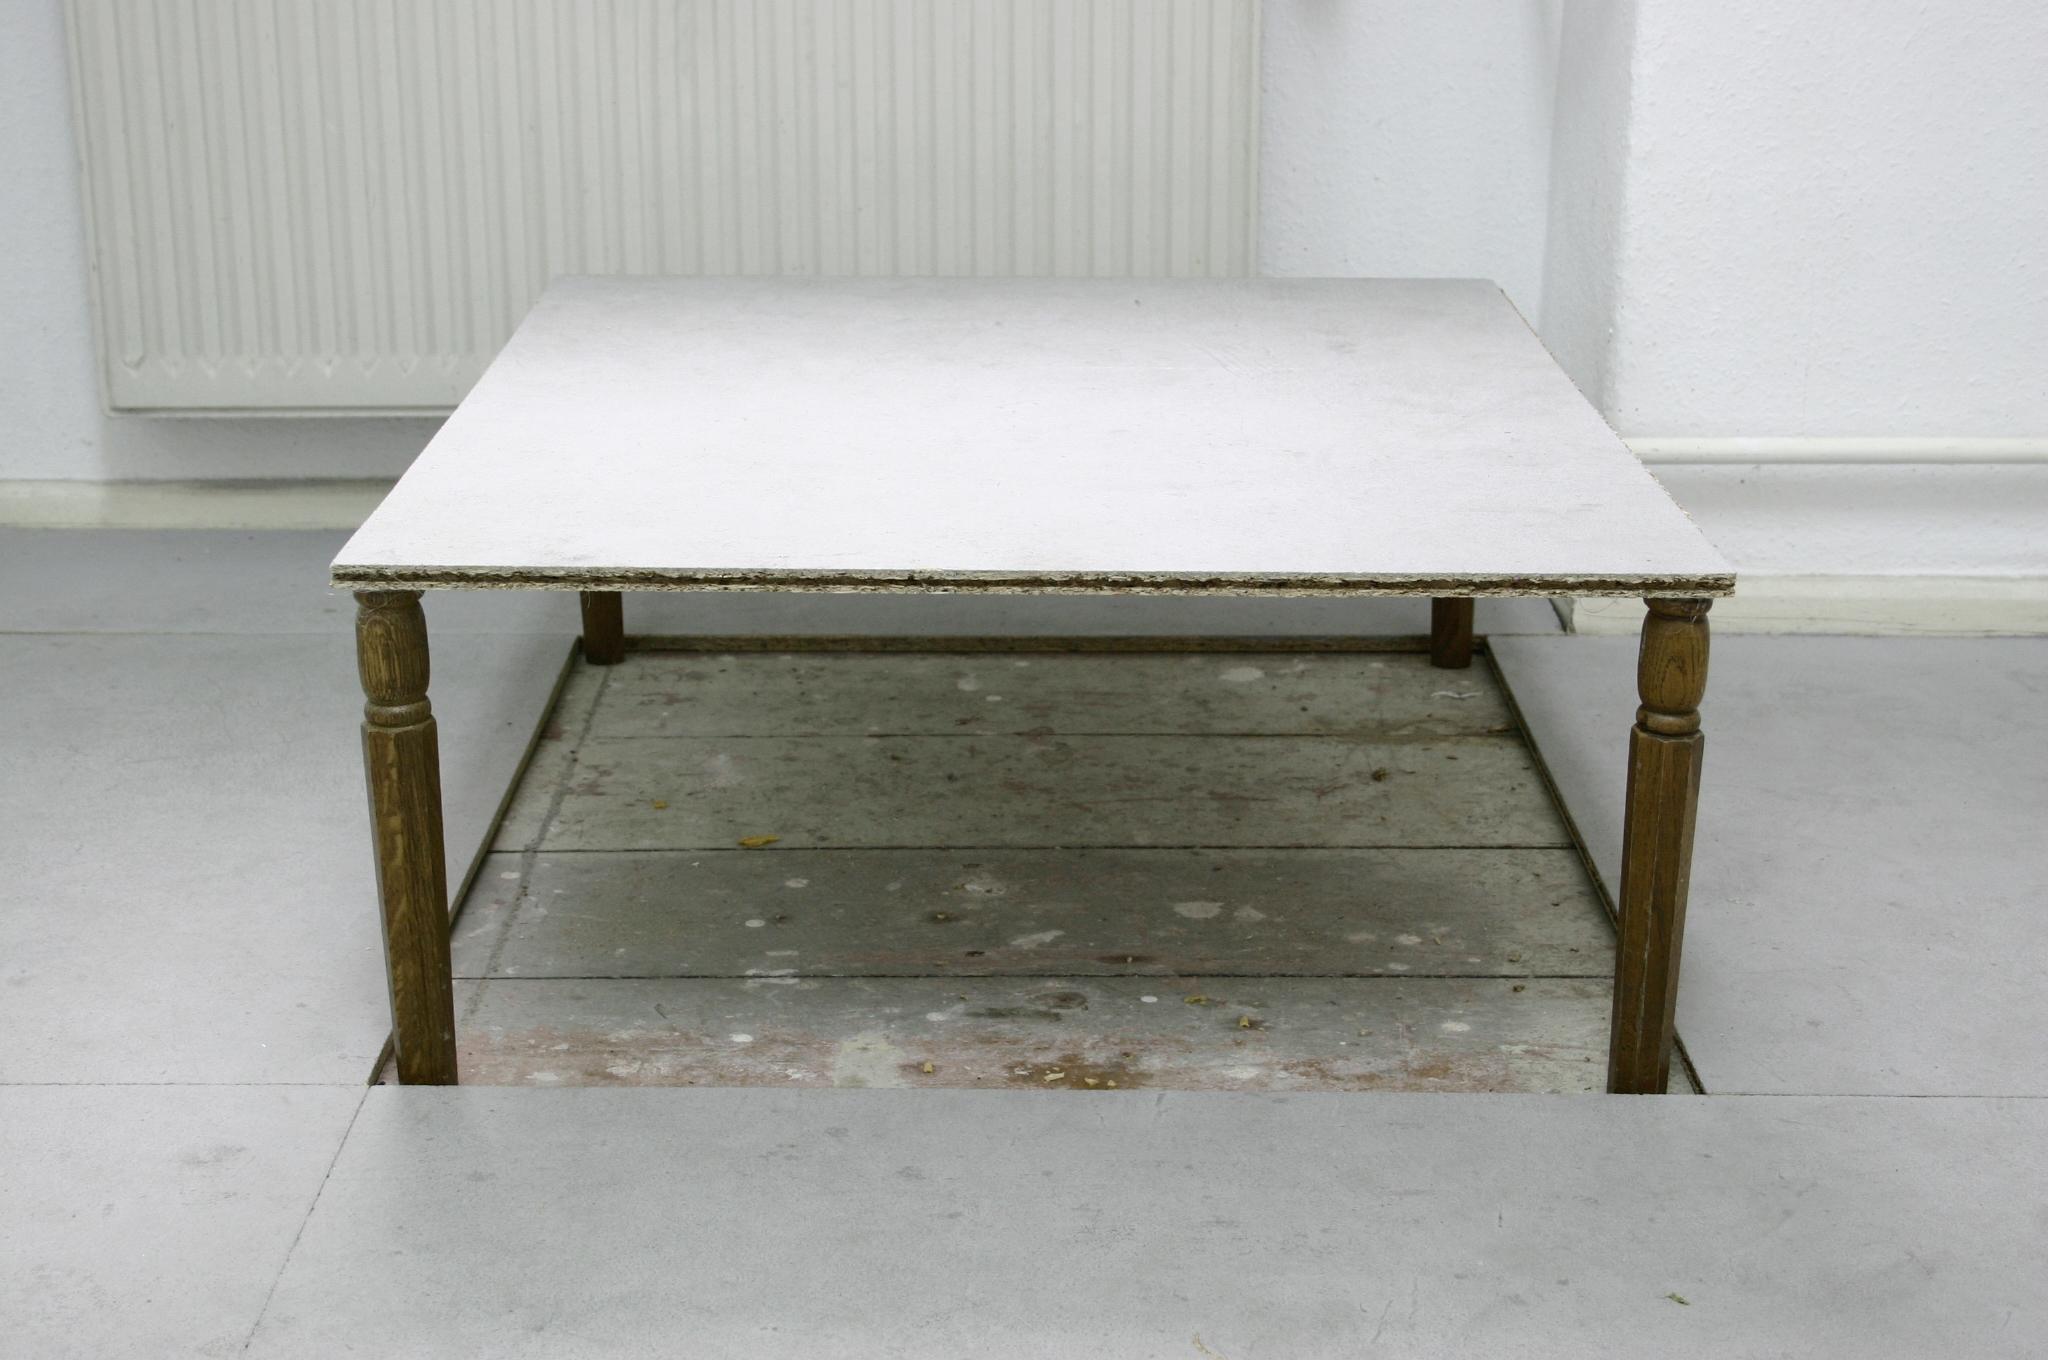 Speculation   Intervention floor Gallery SAVVY, Berlin (30x60x70cm).2010